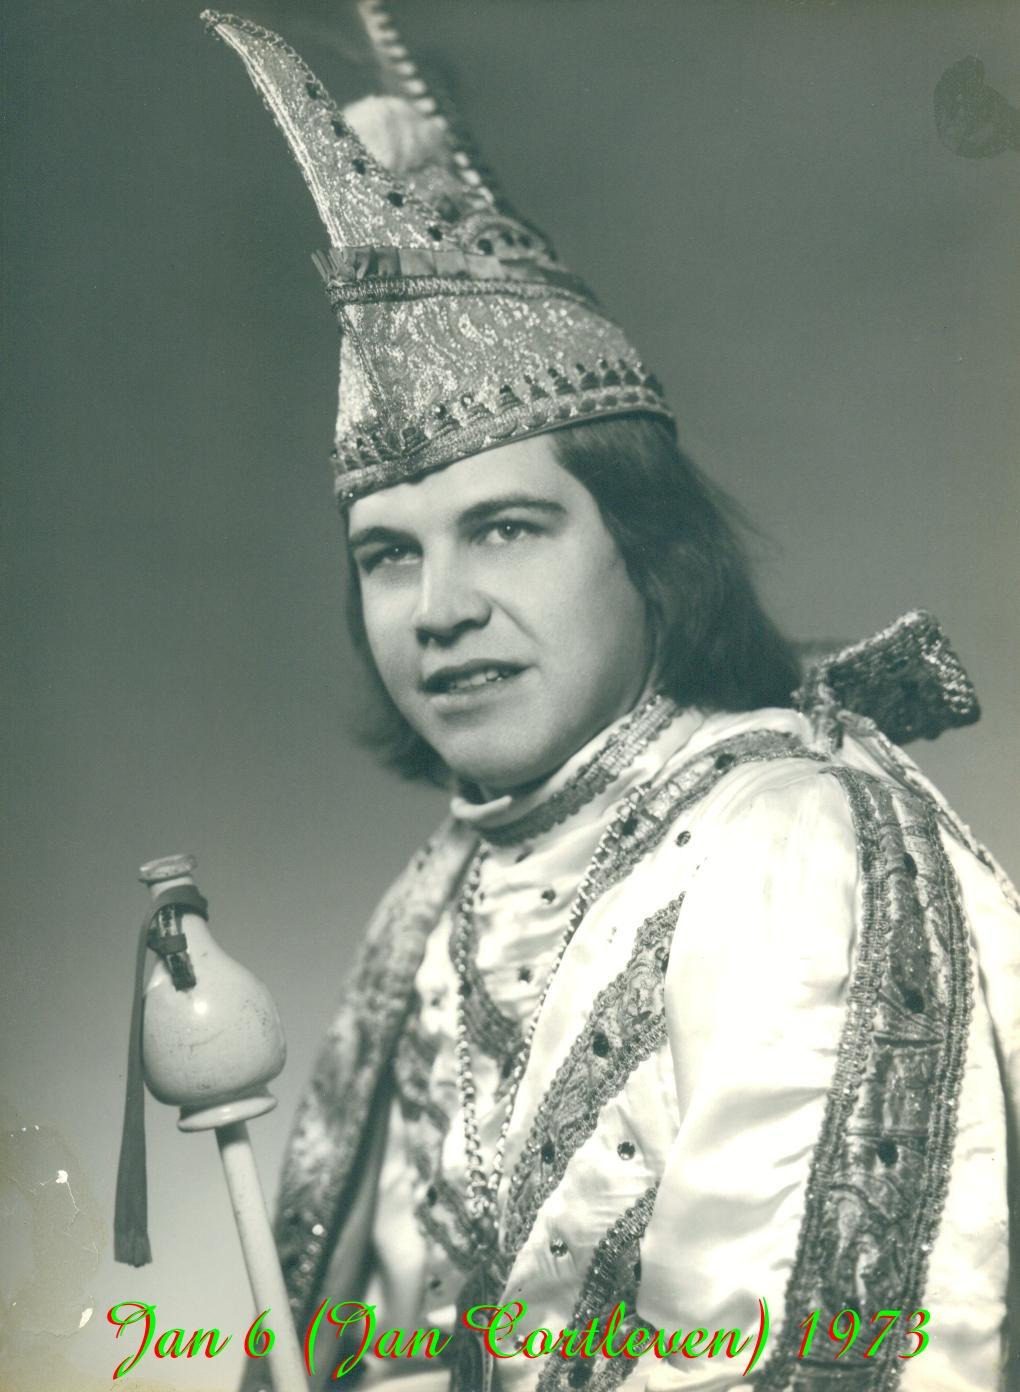 1973 Prins Jan (VI) Cortlever